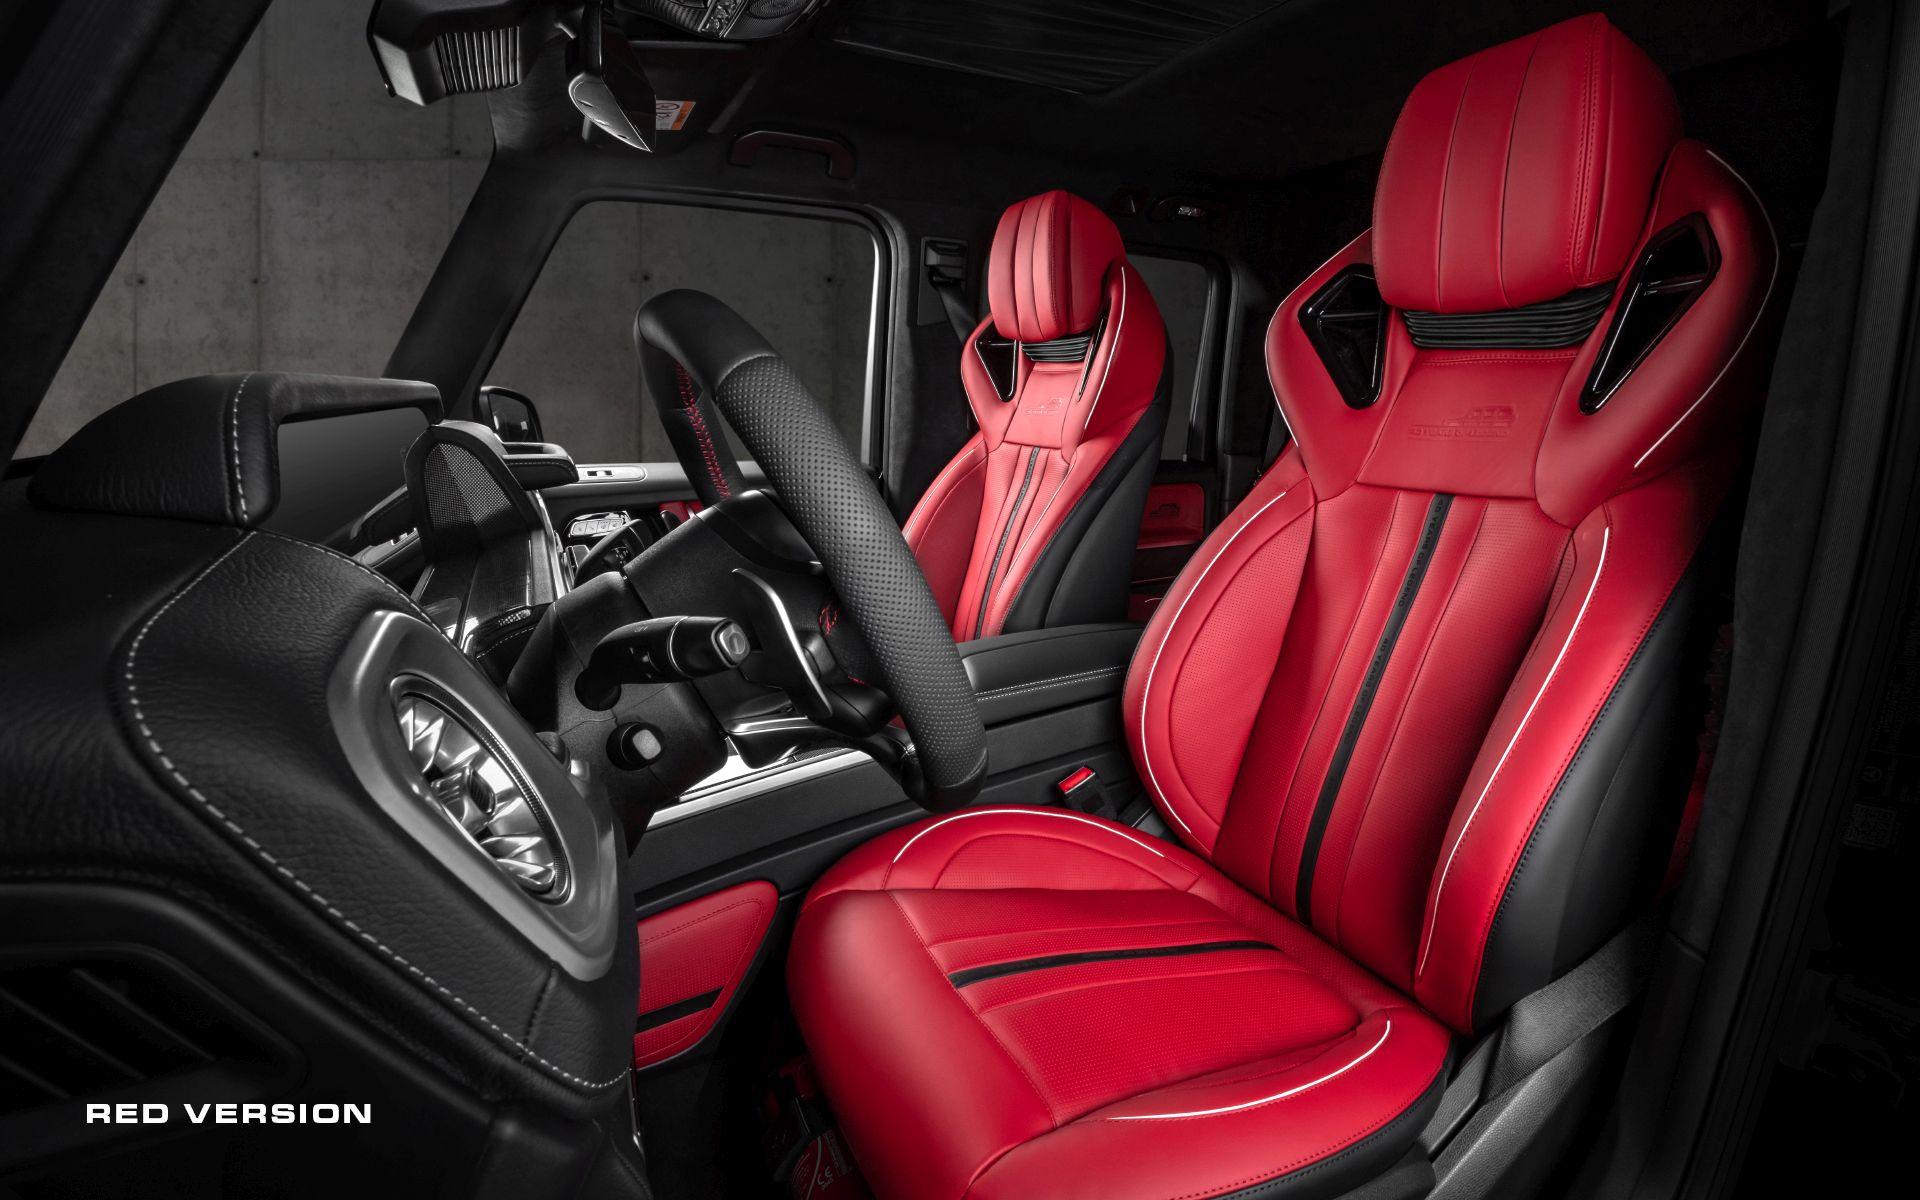 Mercedes-Benz G63 AMG 40th Anniversary Edition